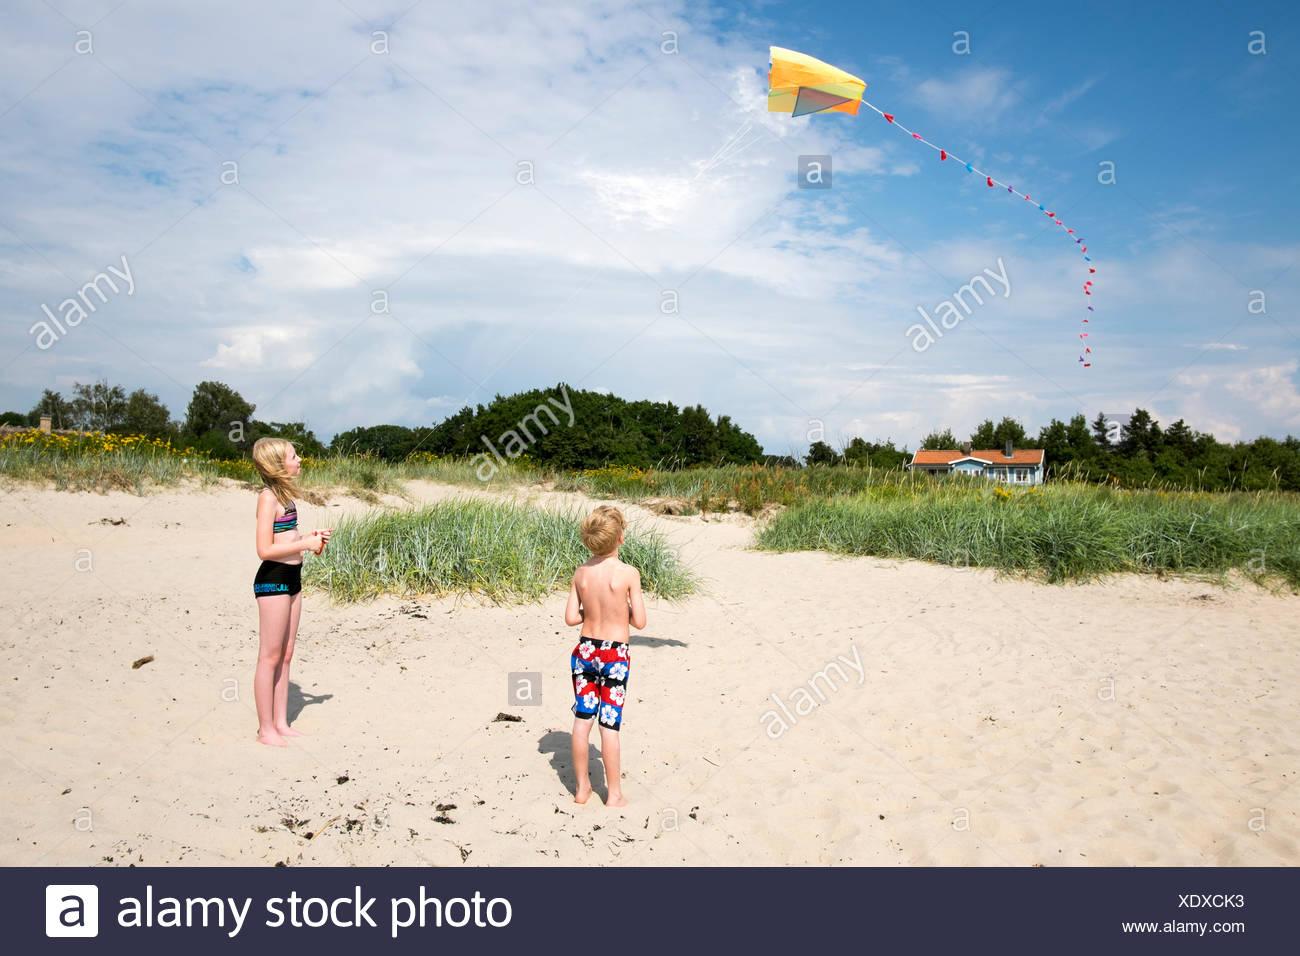 Sweden, Skane, Vejbystrand, Boy (6-7) and girl (10-11) flying kite - Stock Image